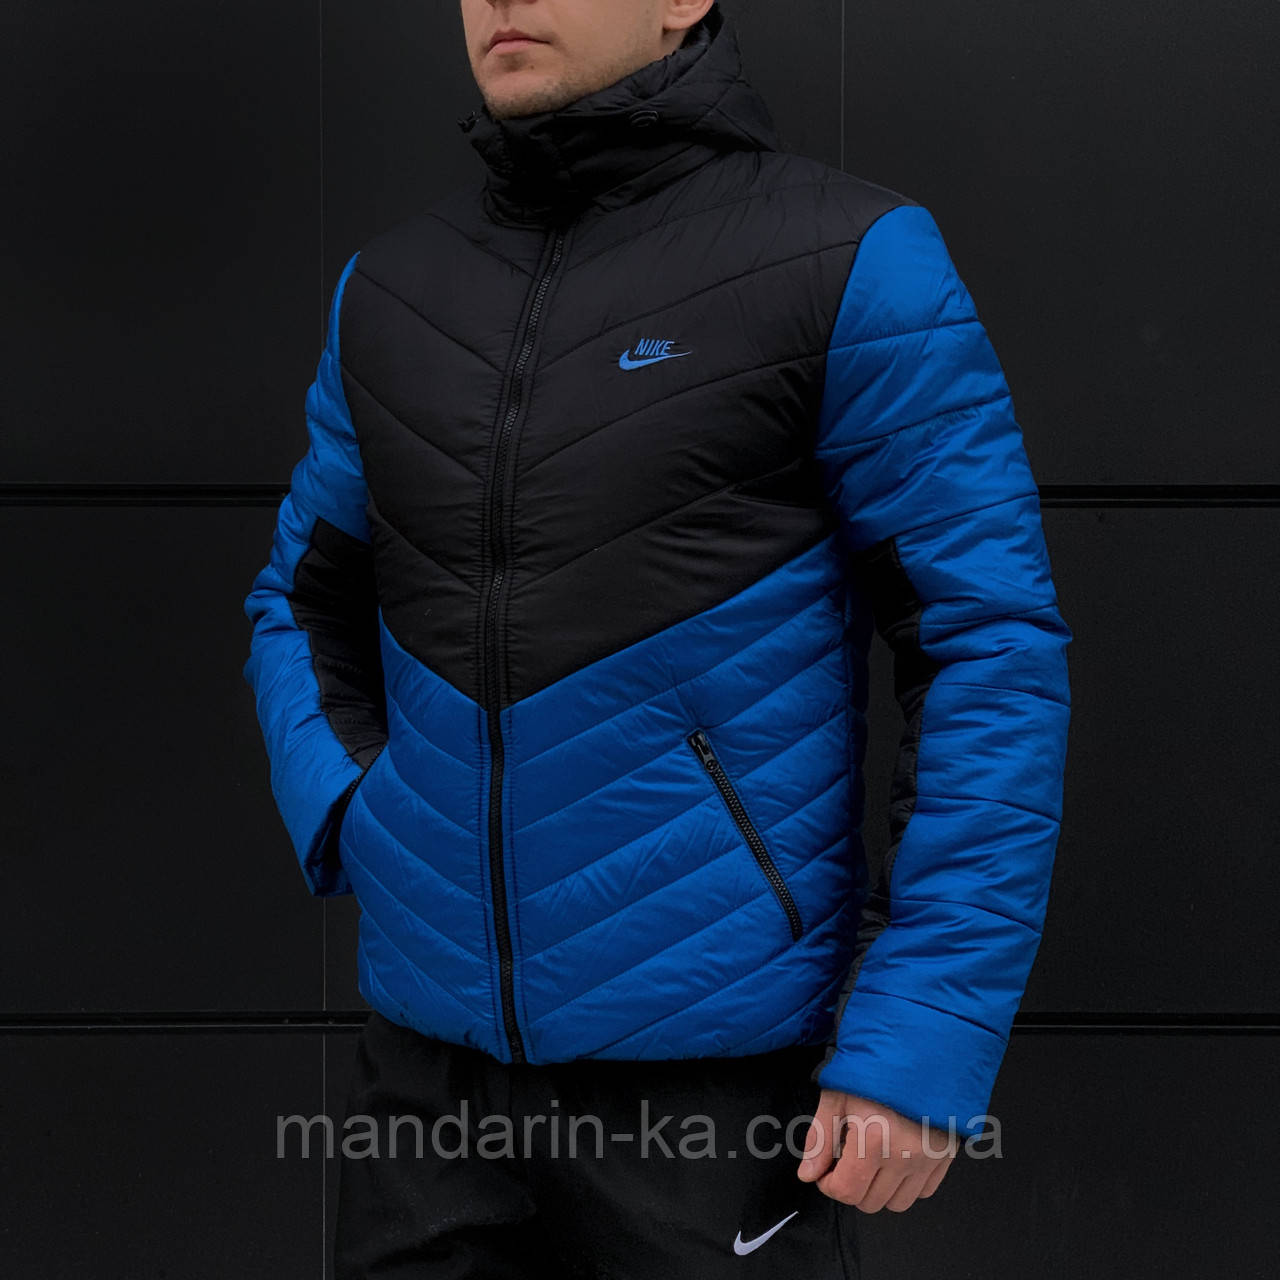 feb03ea2 Зимняя мужская куртка Nike Найк сине черная (реплика) размер XXL, цена 1  050 грн., купить в Киеве — Prom.ua (ID#802454241)